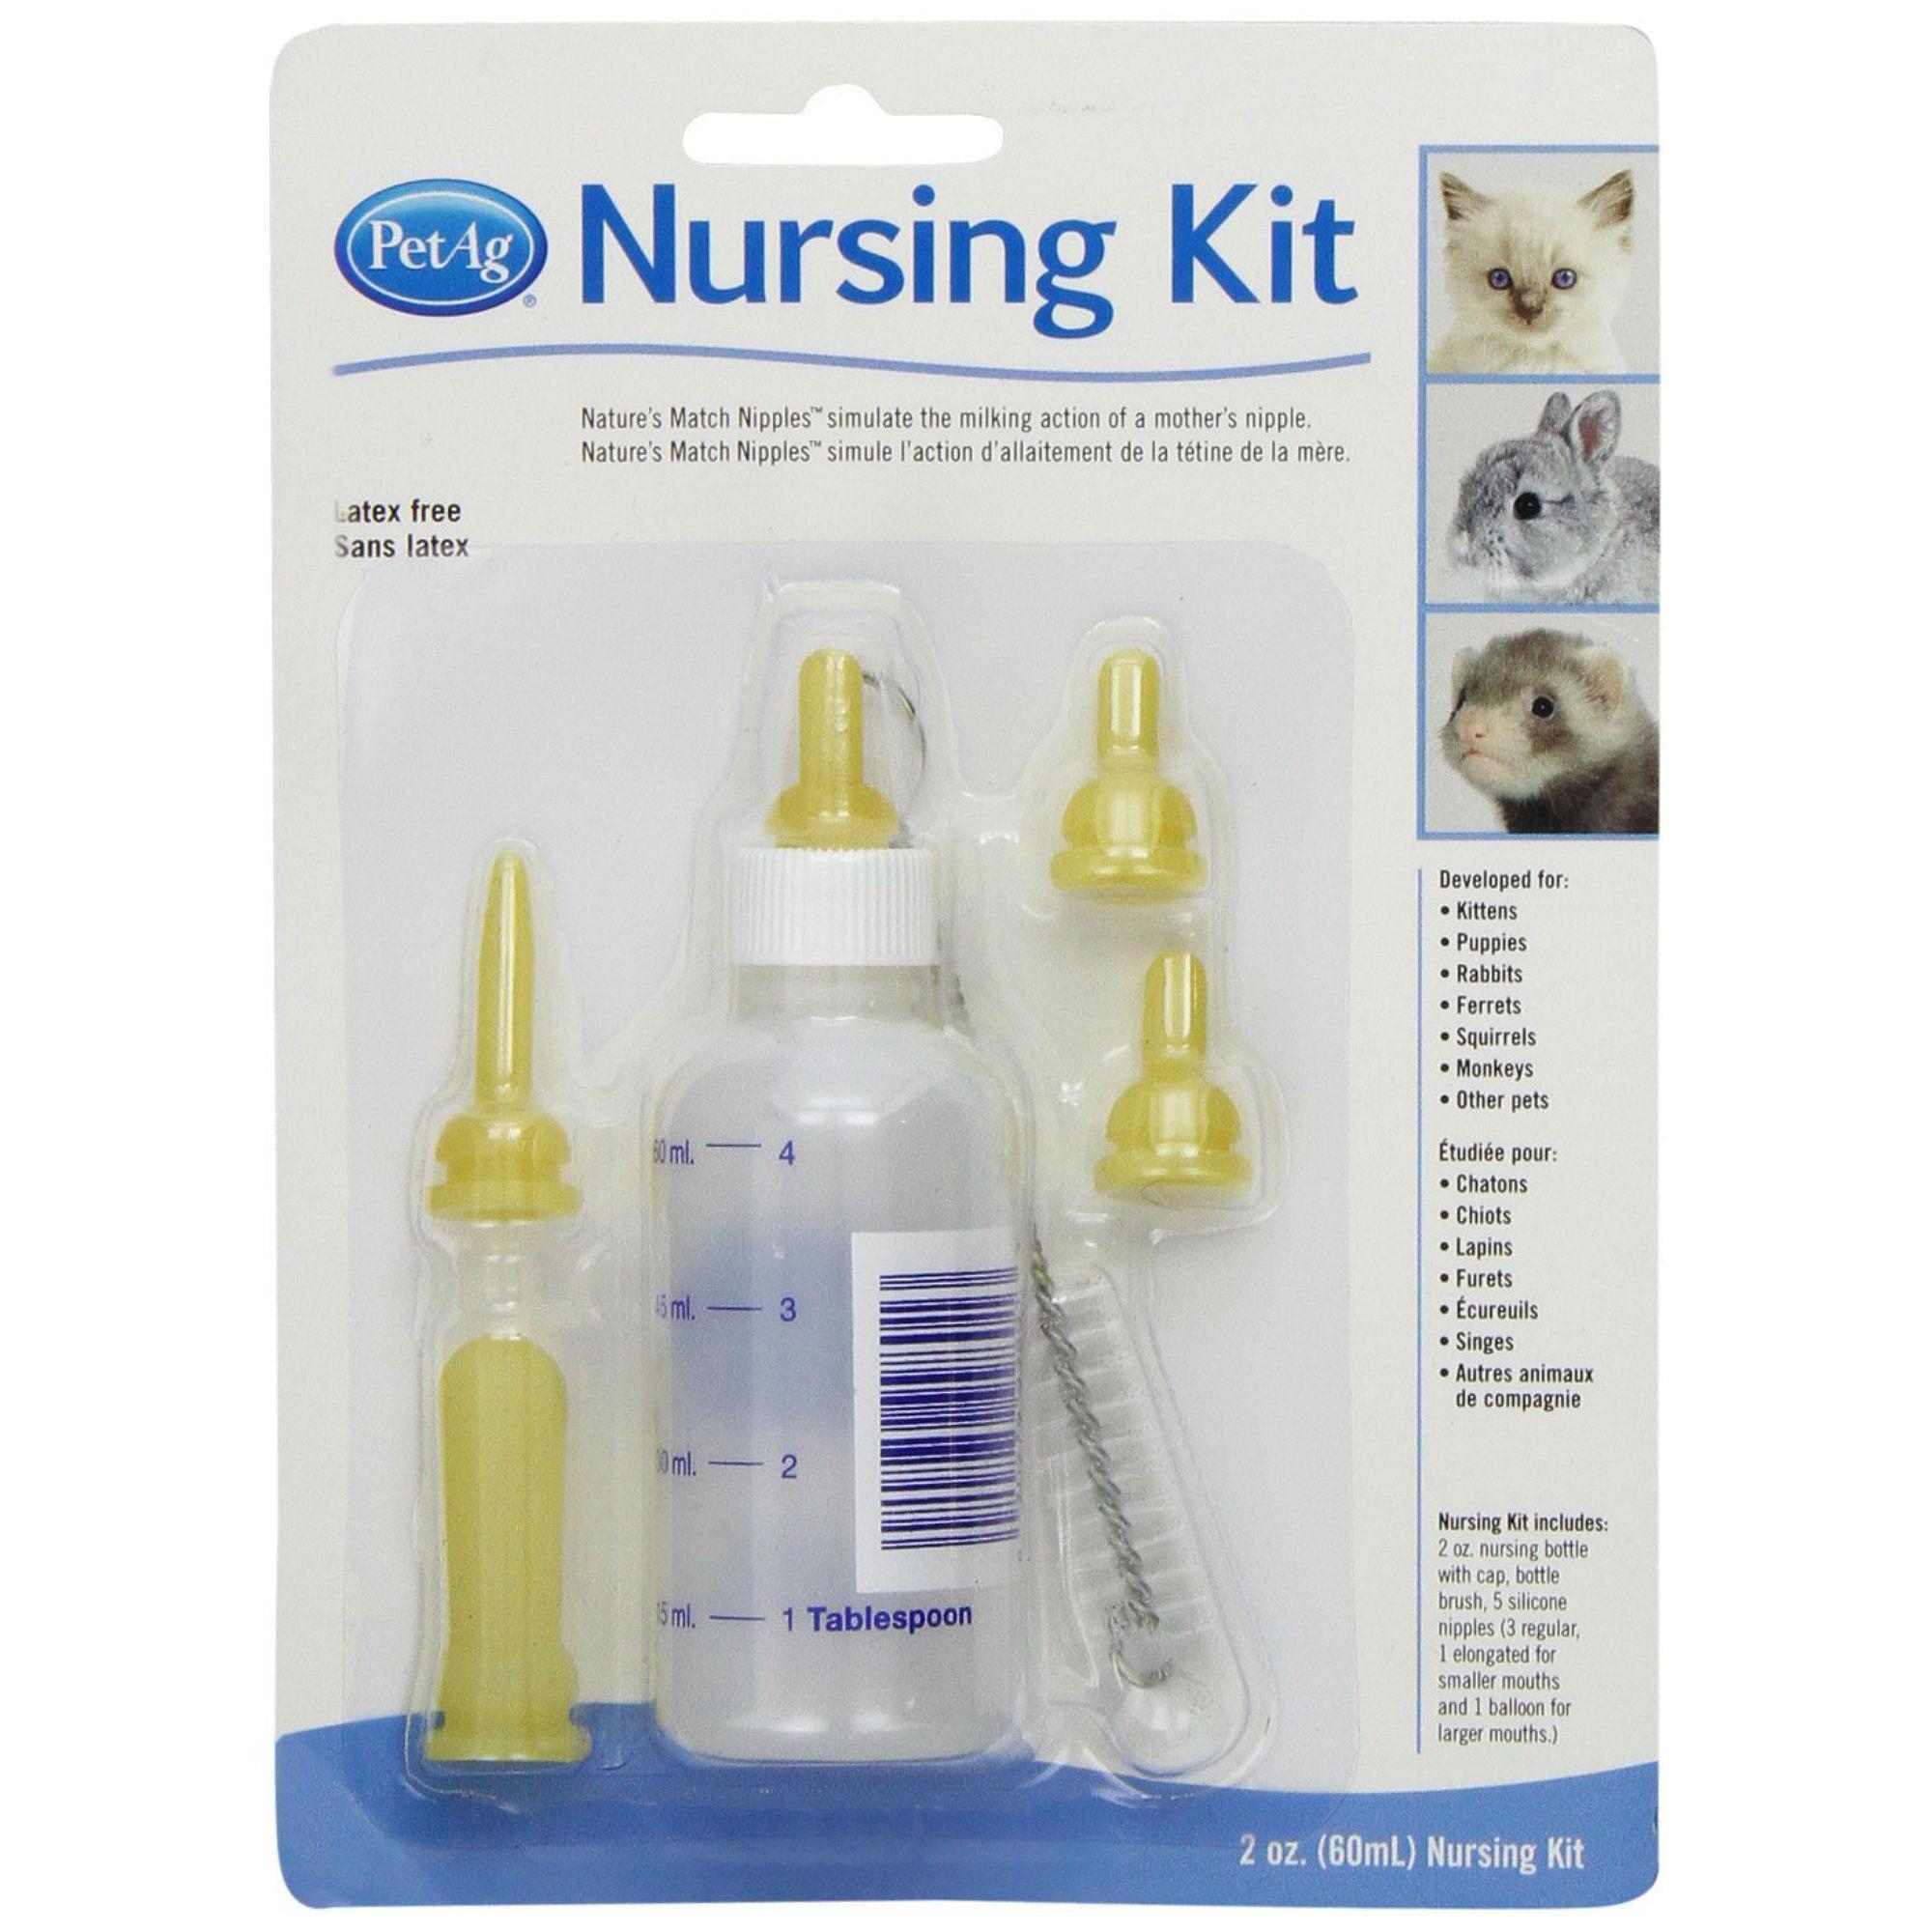 PetAg Pet Nursing Kit